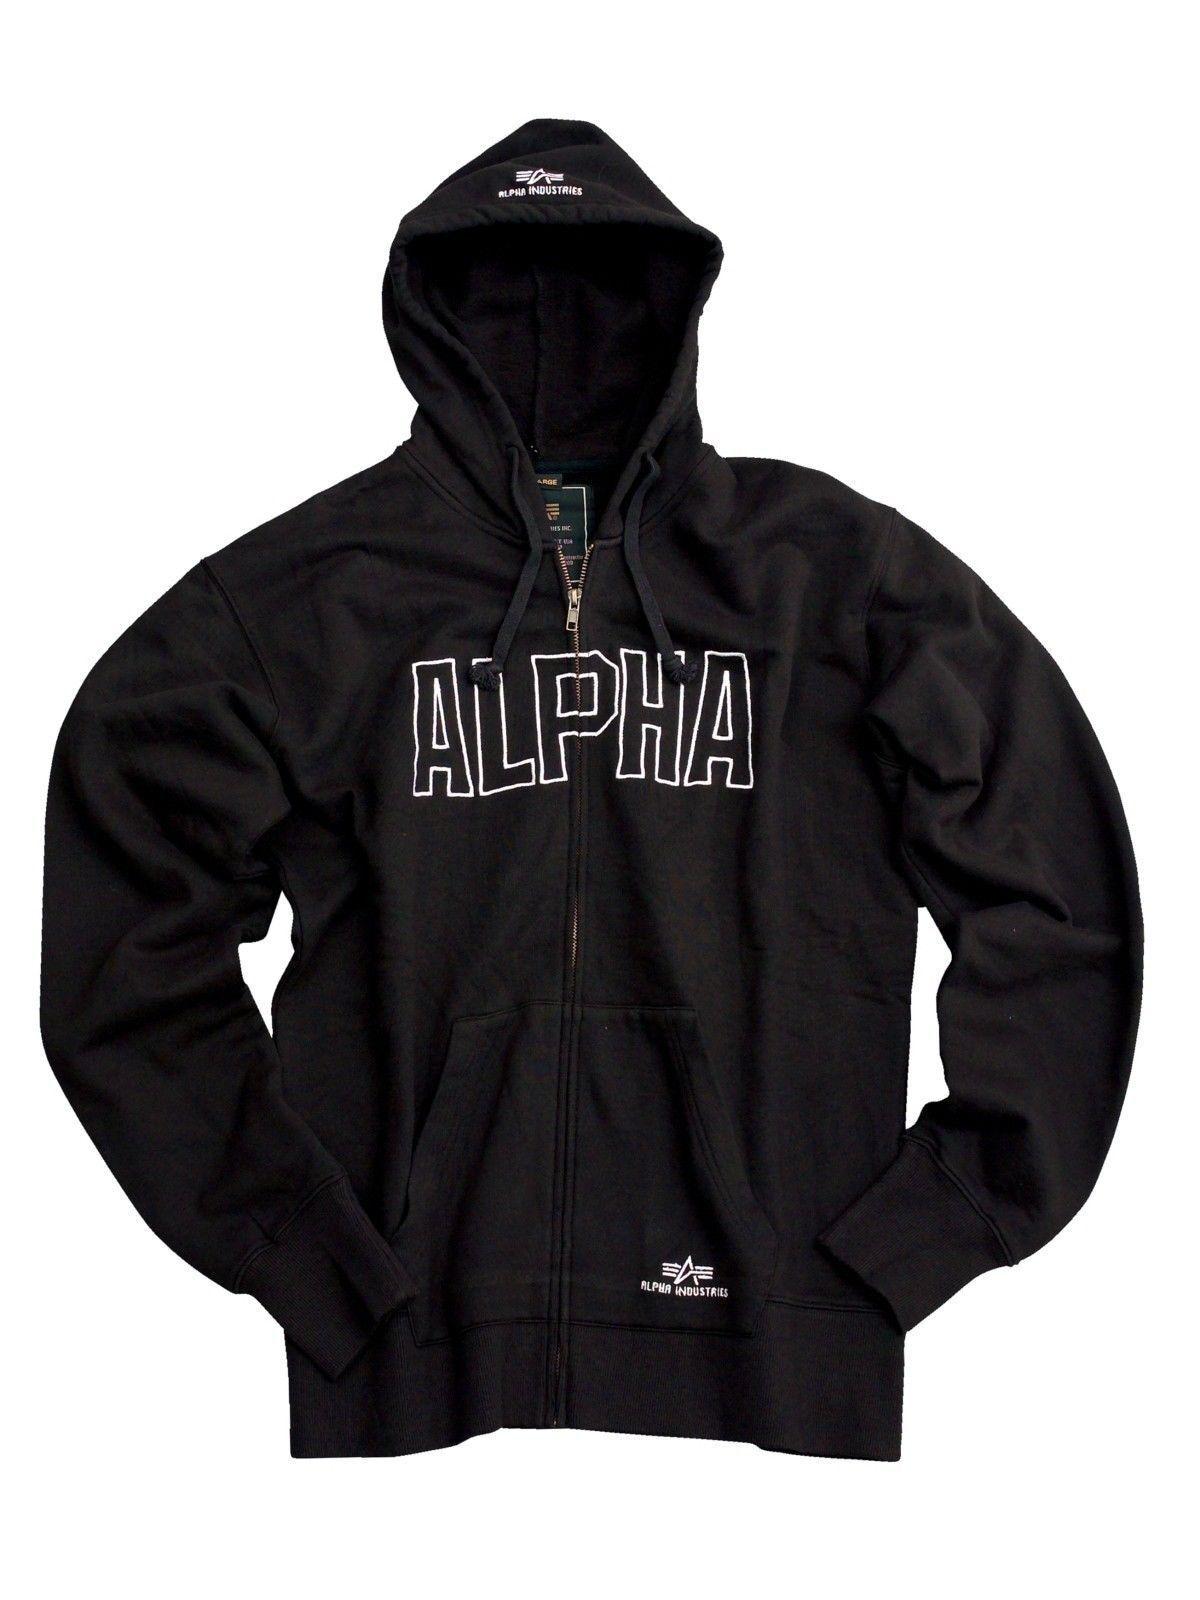 Alpha Industries Industries Industries Track Hd Jkt 183313 03 Zip Hood schwarz Größe 2XL 0dcdb5